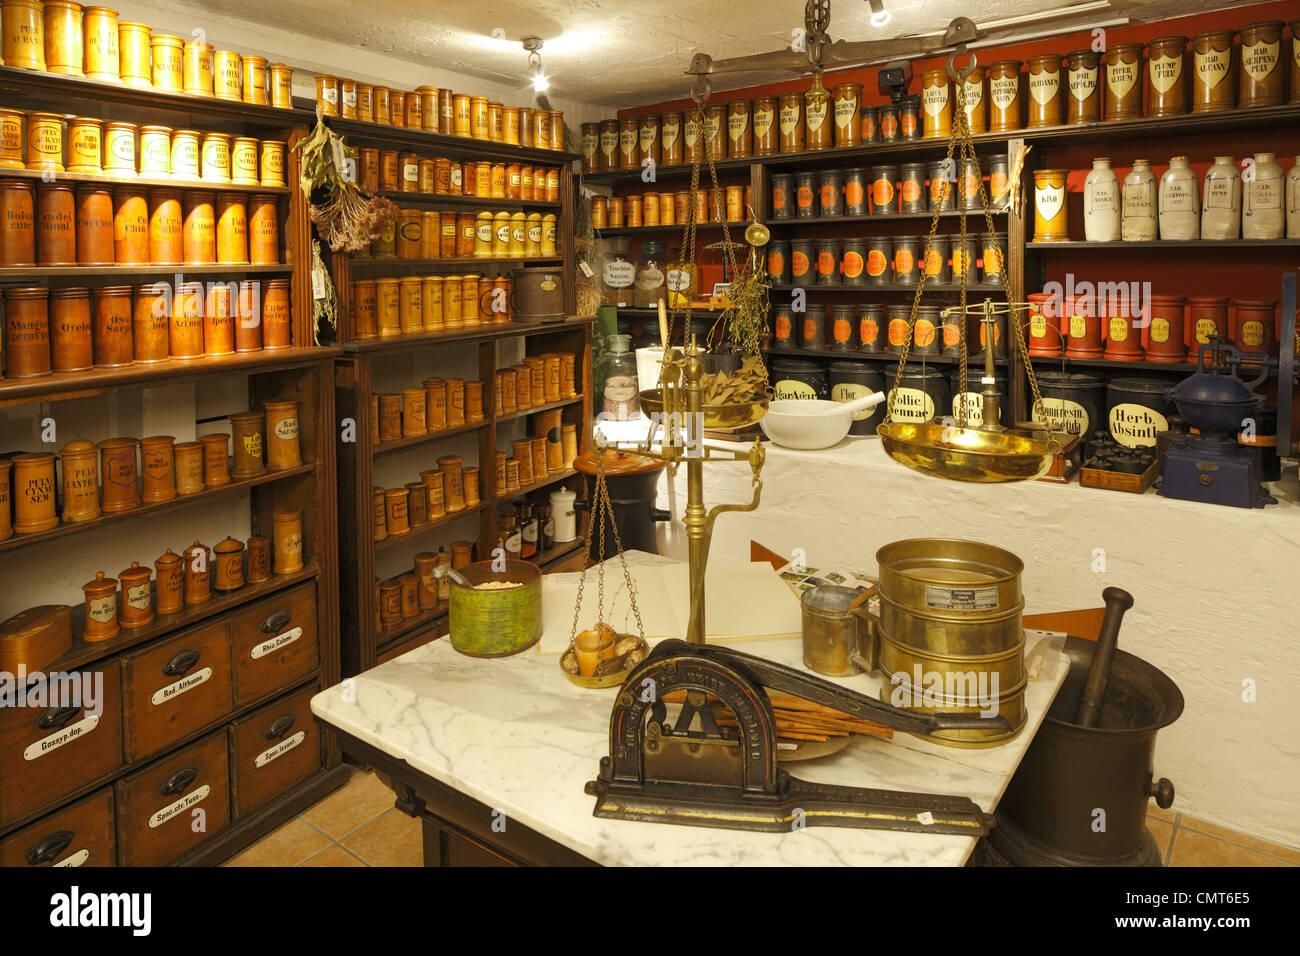 D-Dortmund, Ruhr area, Westphalia, North Rhine-Westphalia, NRW, Adler pharmacy, pharmacy museum, Kraeuterkammer, - Stock Image